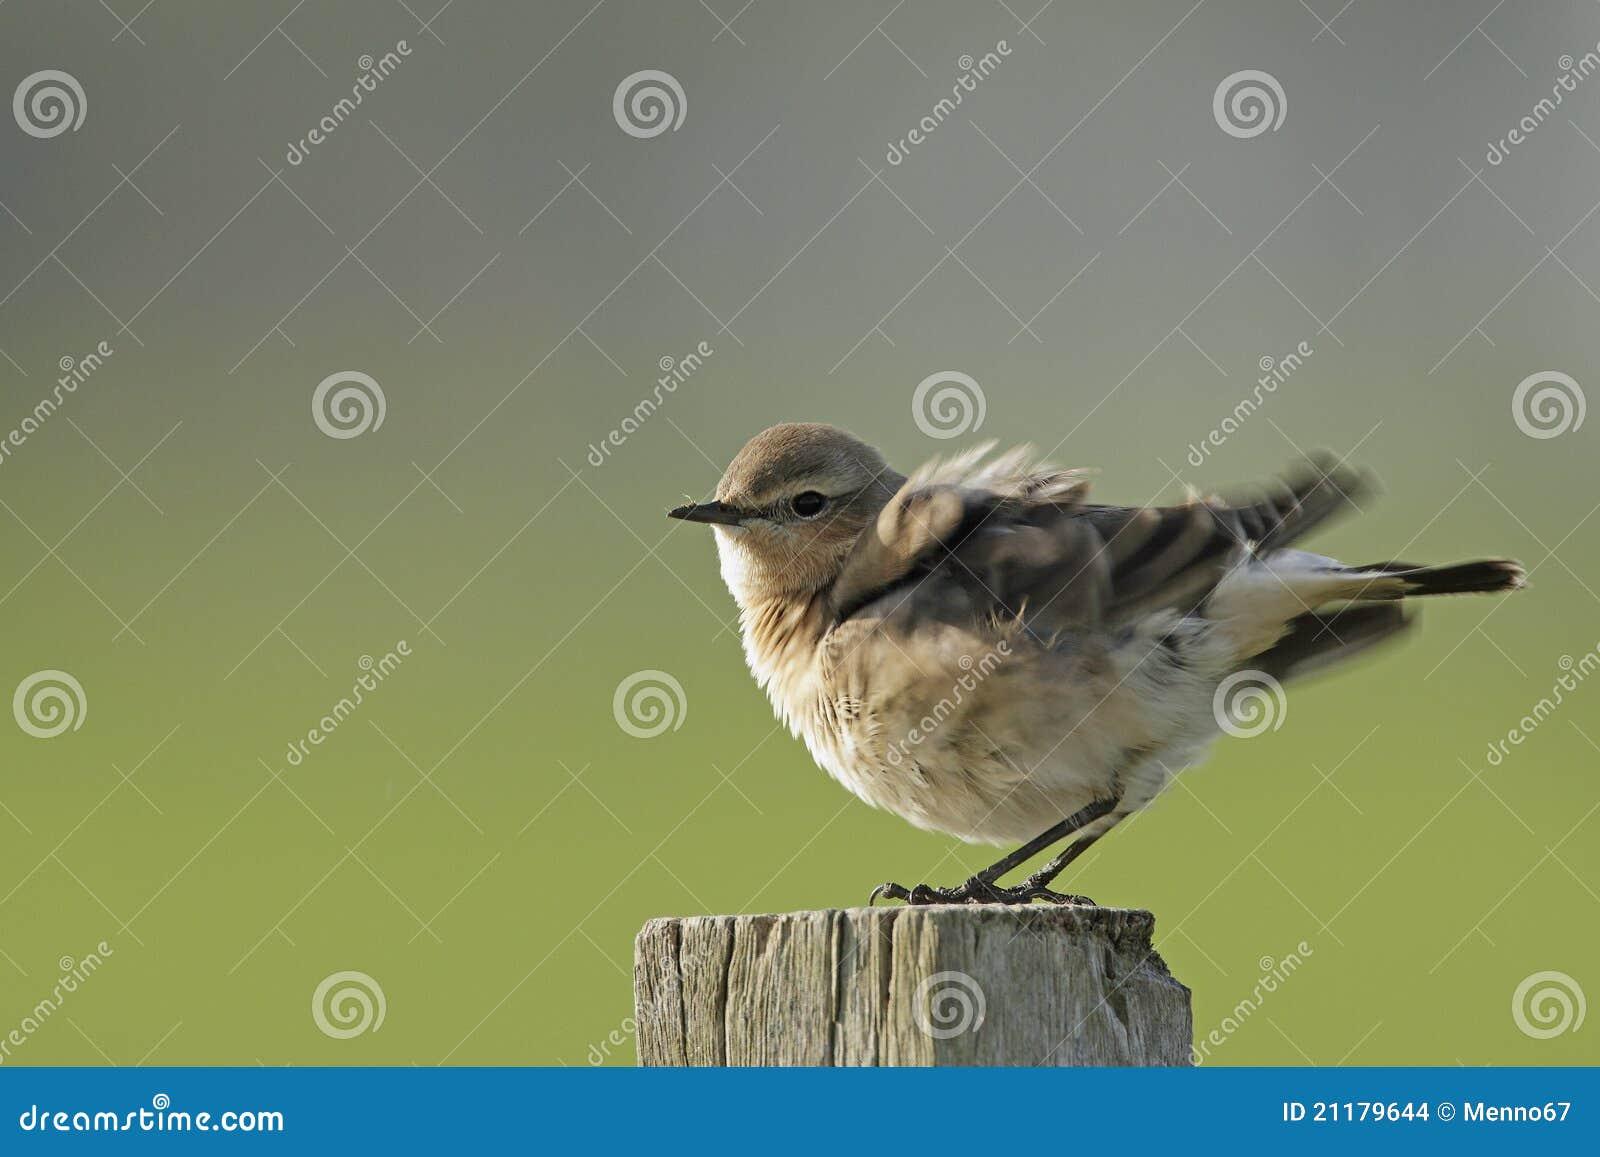 Northern wheatear, oenanthe oenanthe